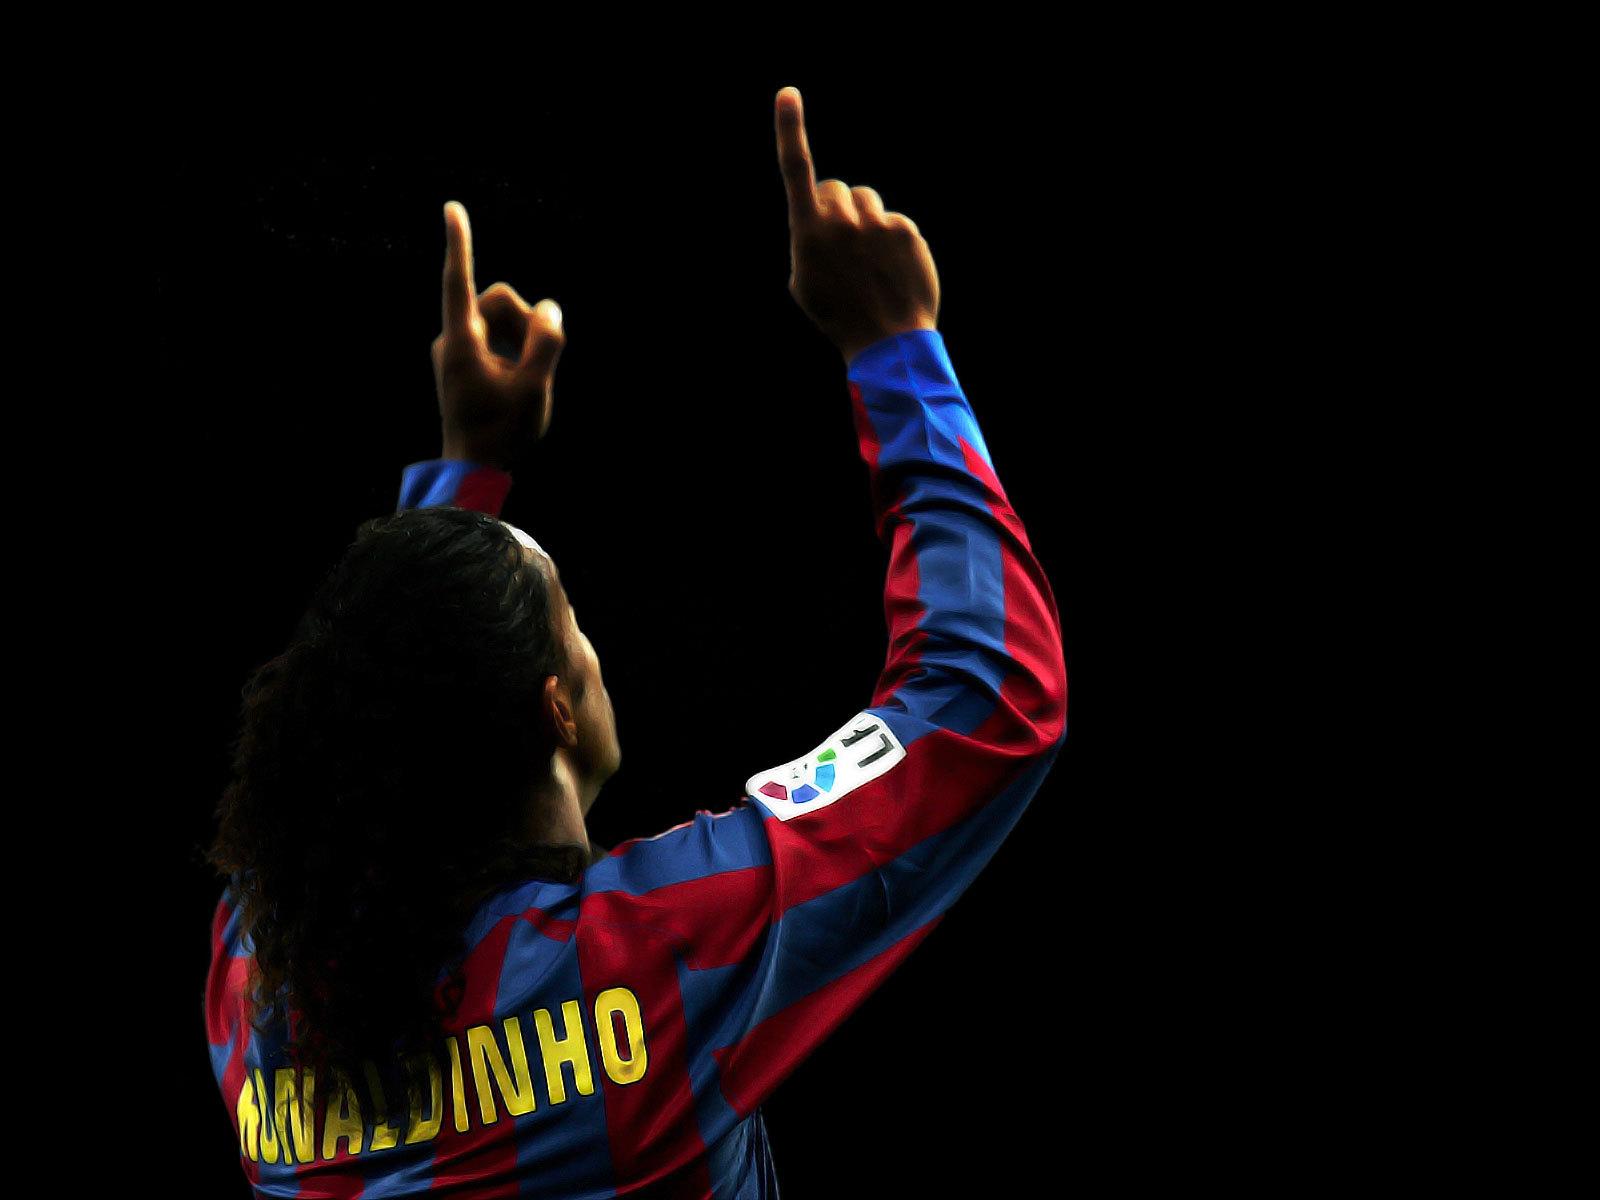 Ronaldinho Football Sport Desktop Photos: The Football Player Of Atletico Mineiro Ronaldinho On The